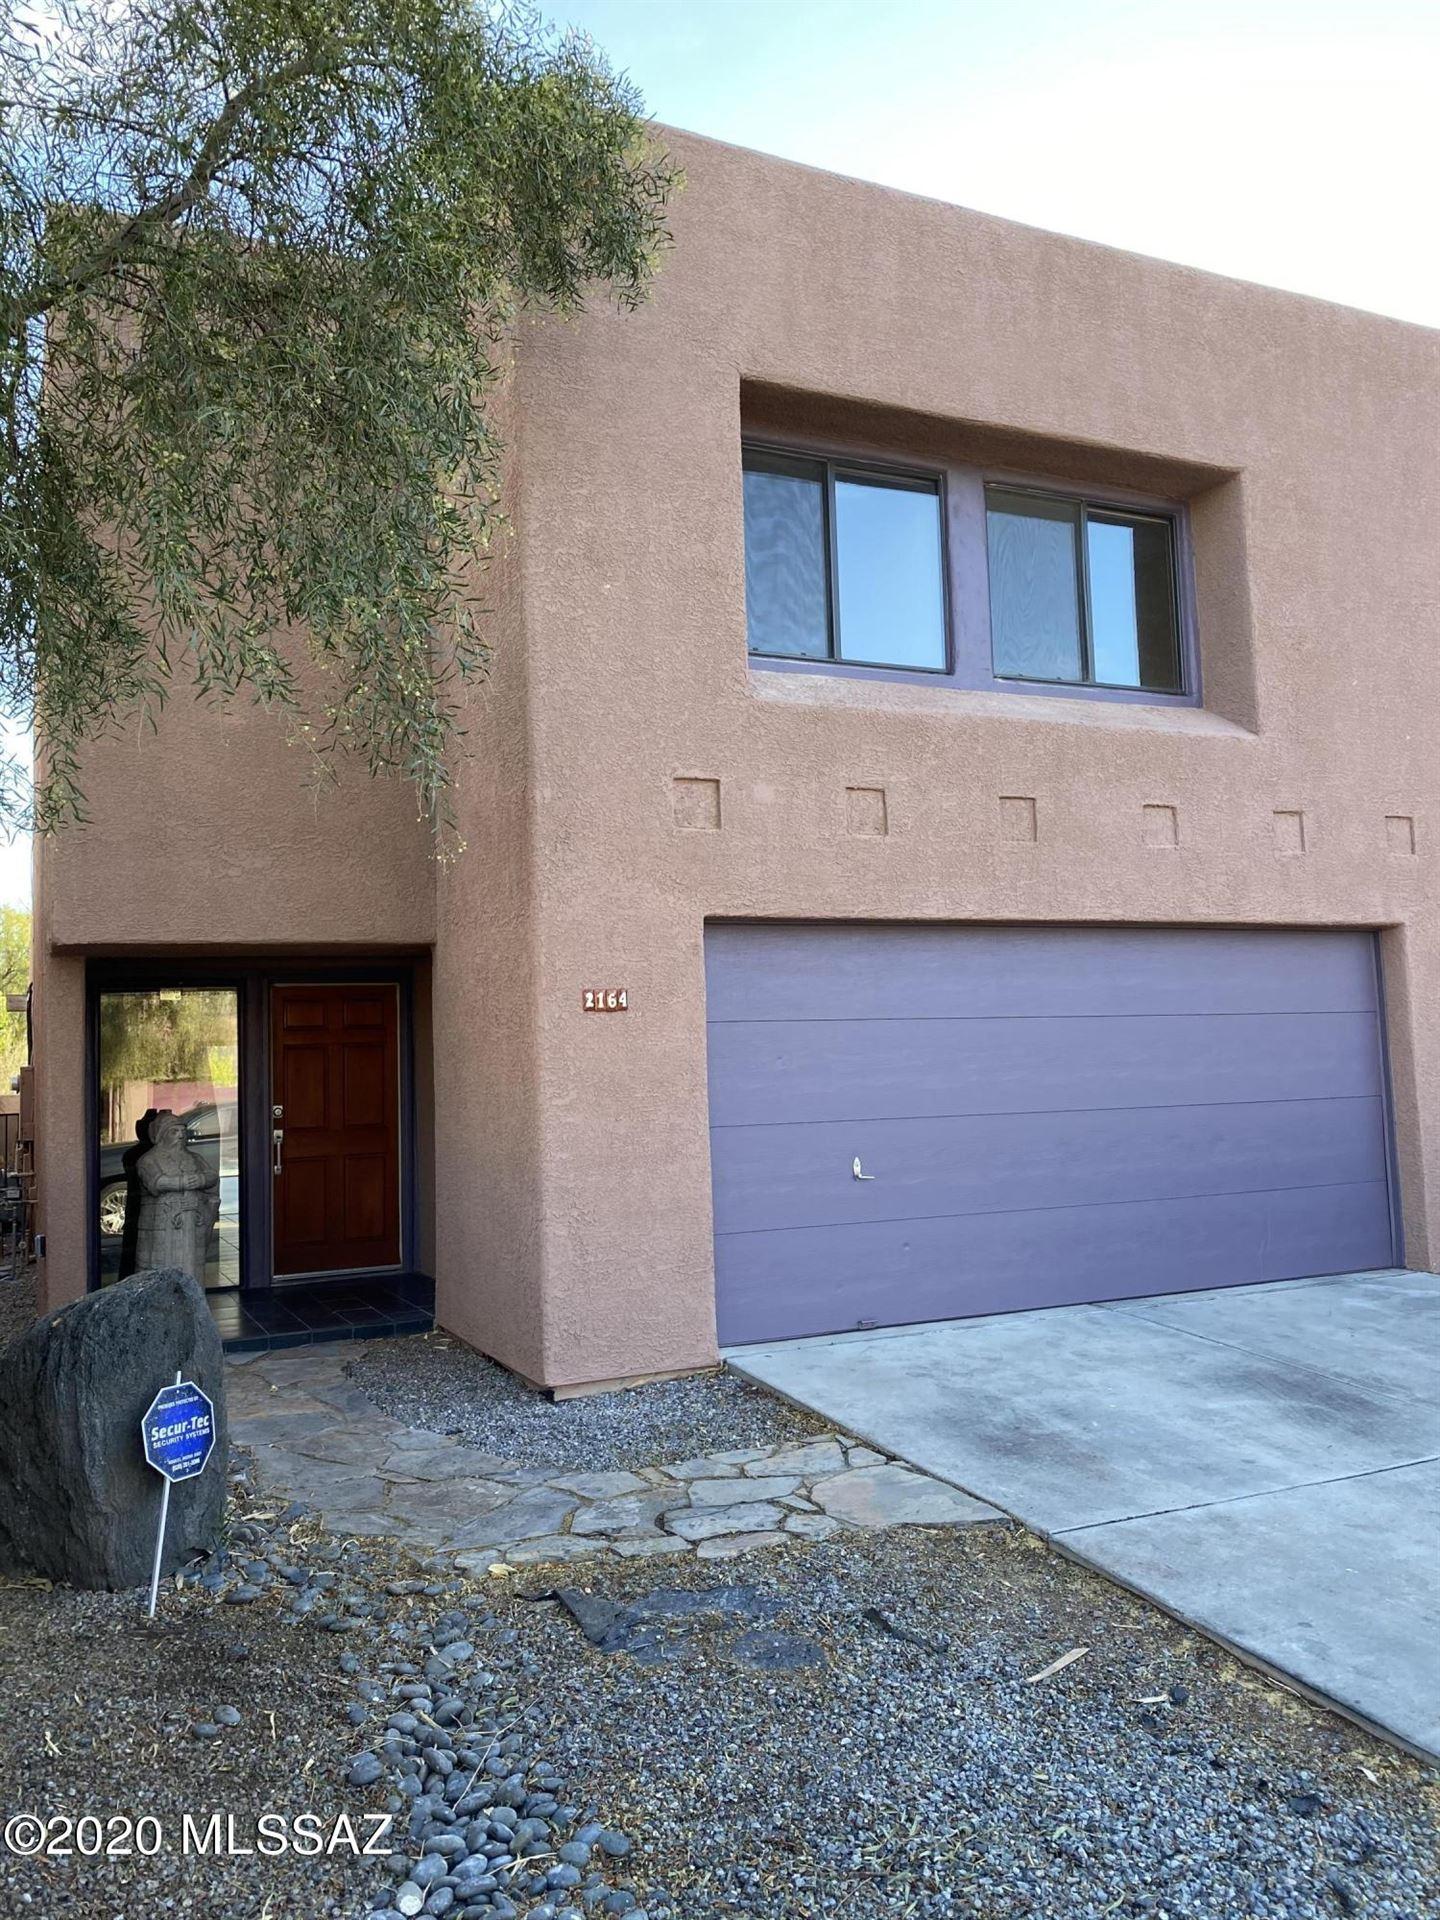 2164 E Gazania Lane, Tucson, AZ 85719 - MLS#: 22030809